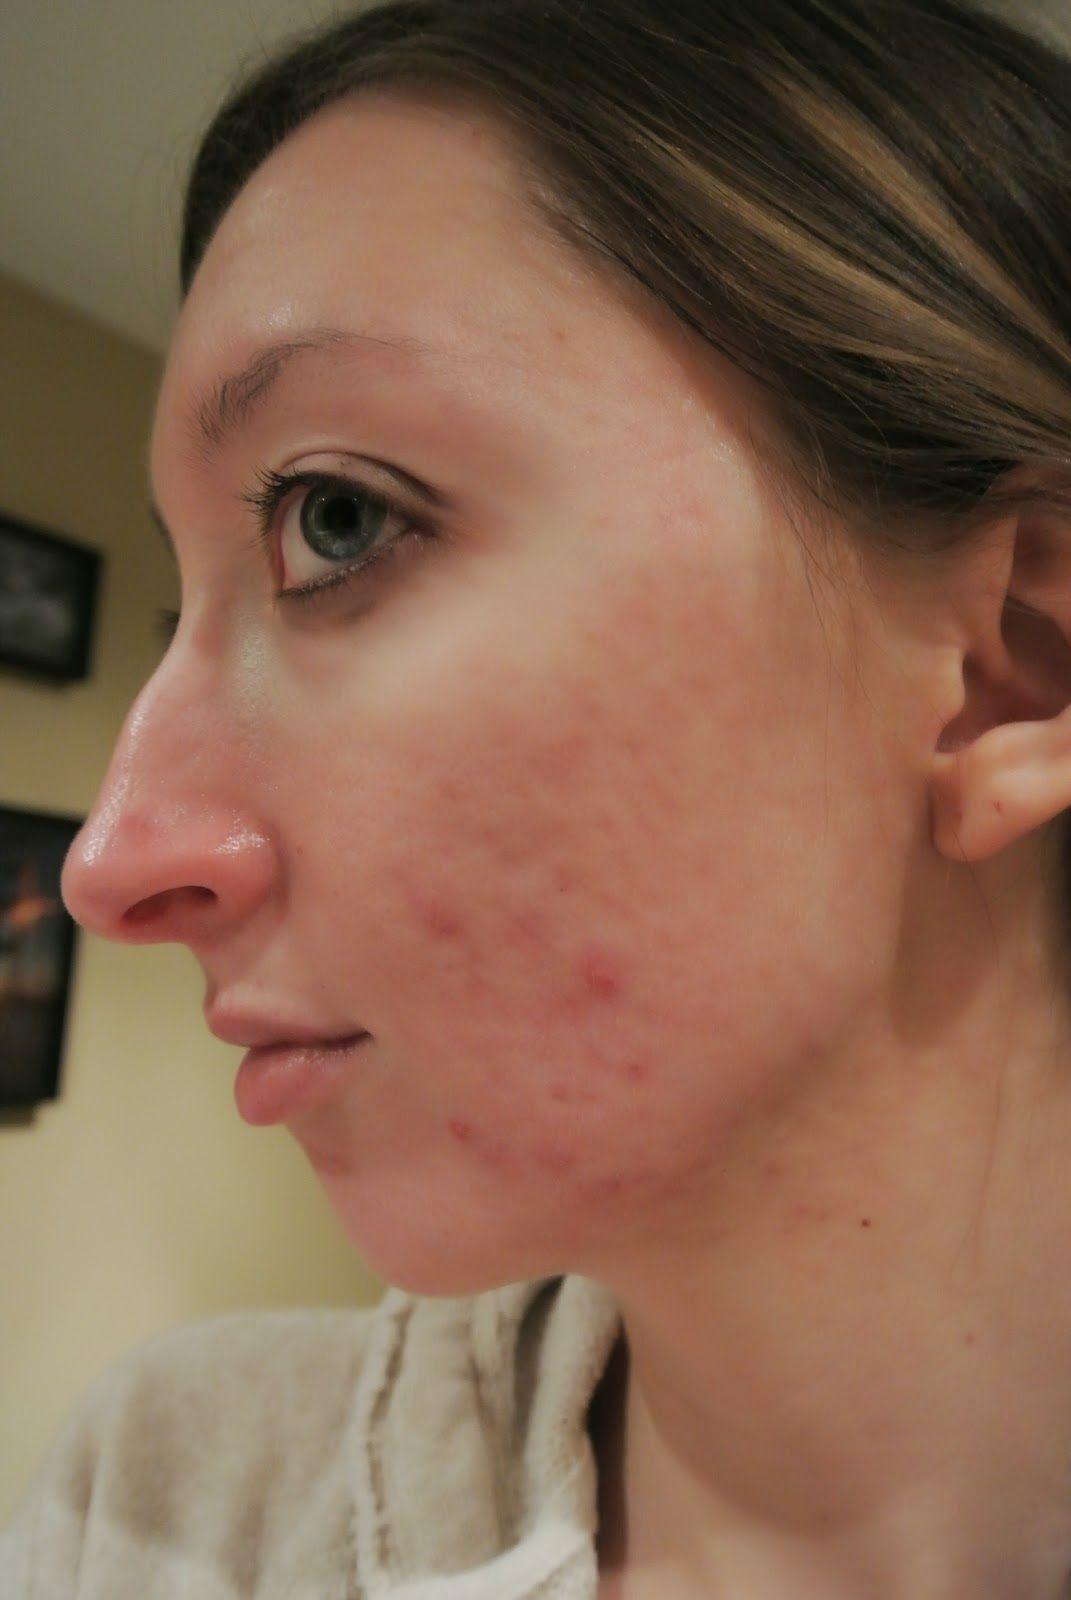 cystic acne accutane not working